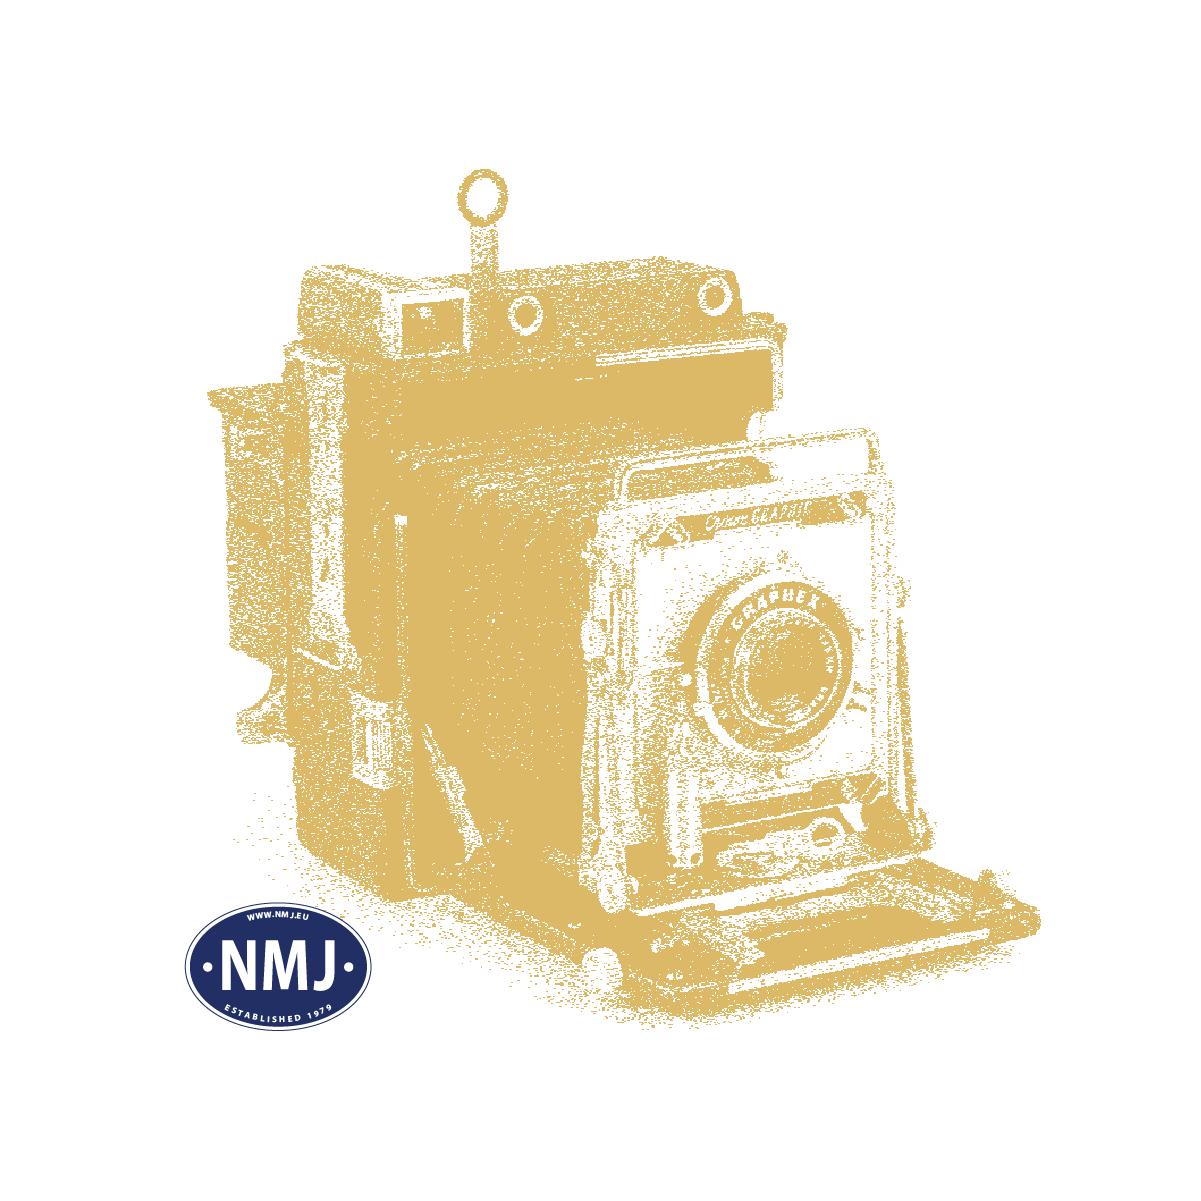 "NMJT90211 - NMJ Topline MAV M61 019 ""Nostalgia"", DCC m/ Sound"